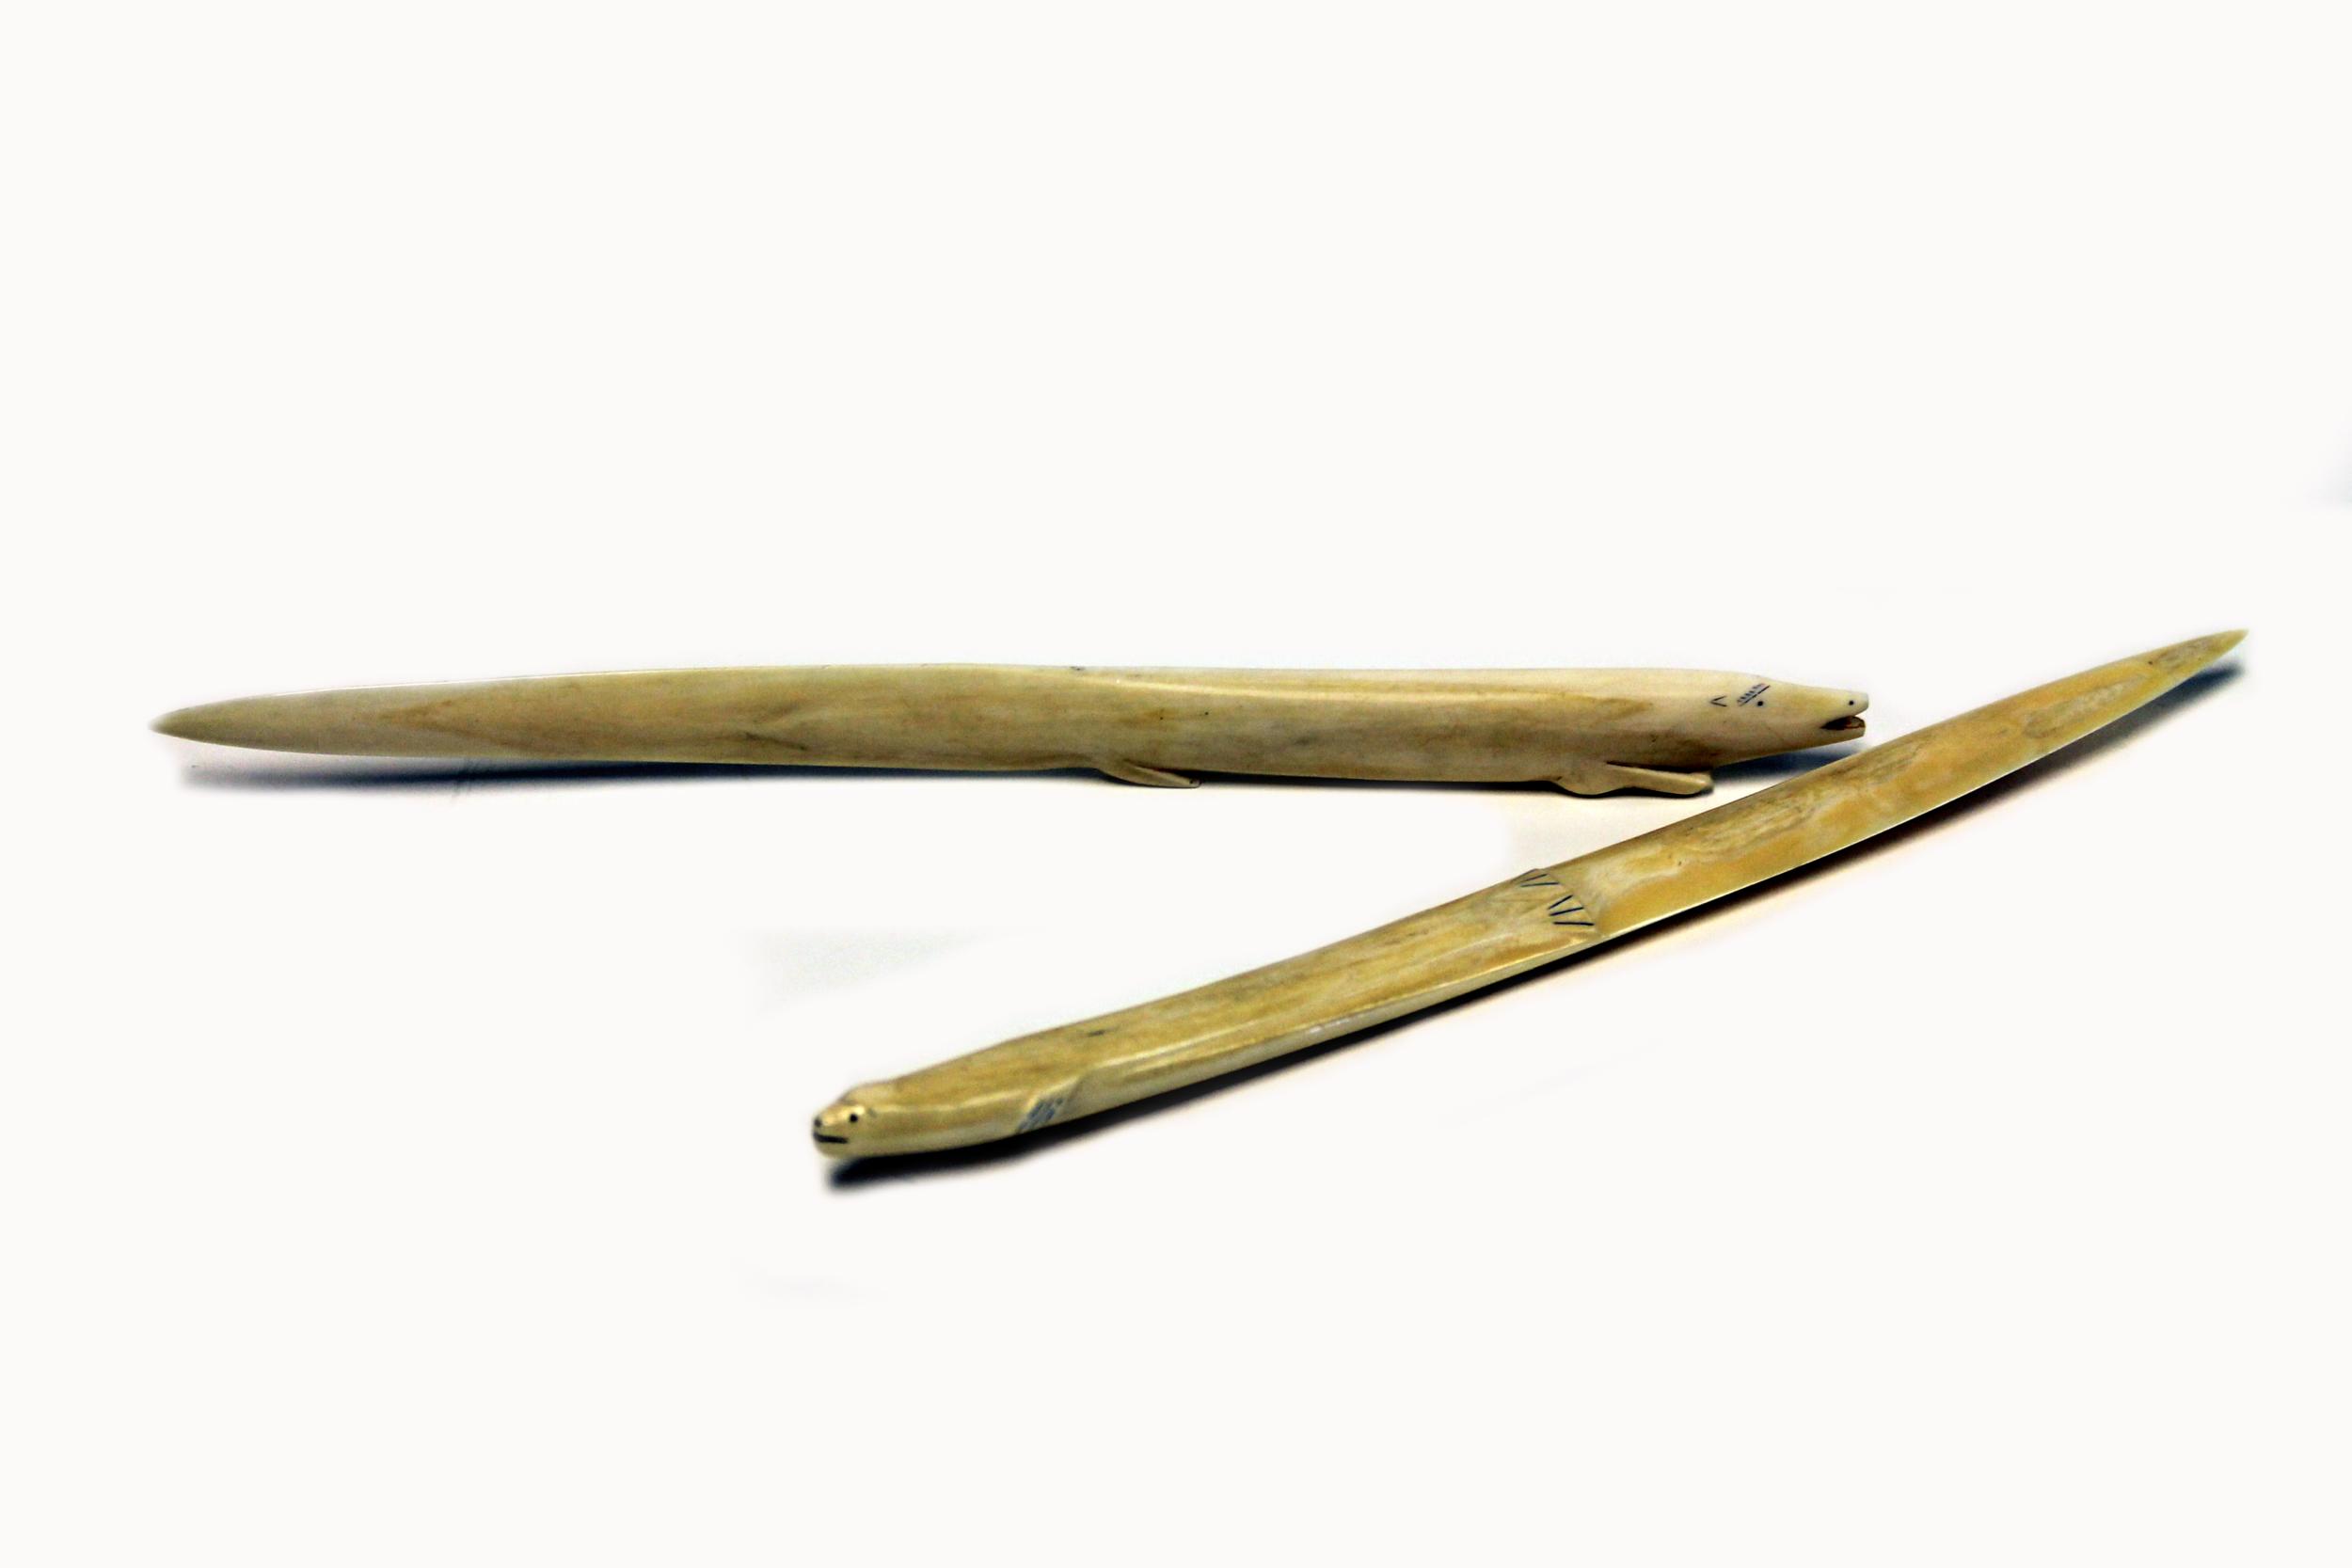 2 Piece Walrus Ivory Letter Openers Barnhart Jewelers